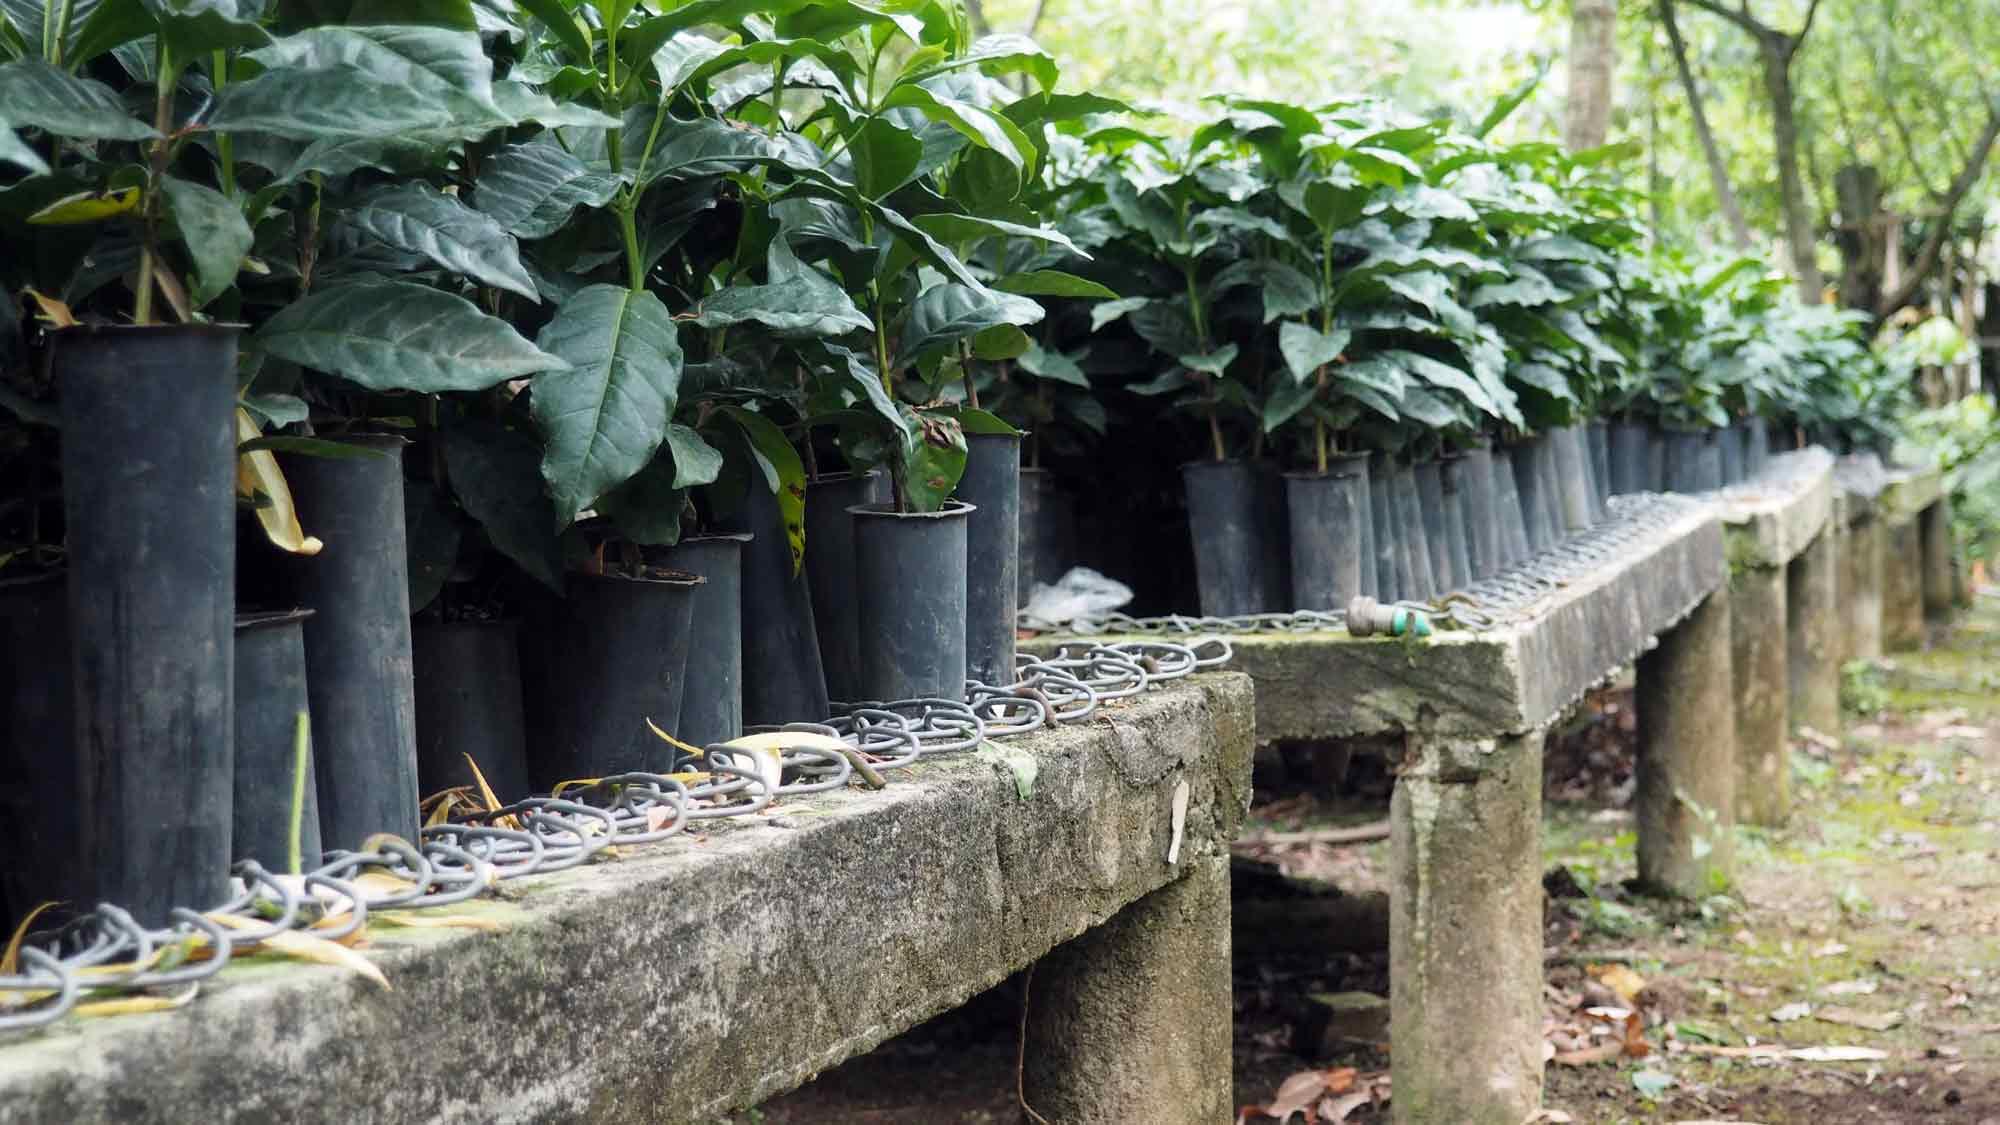 Looking Towards the Future of Guatemalan Coffee